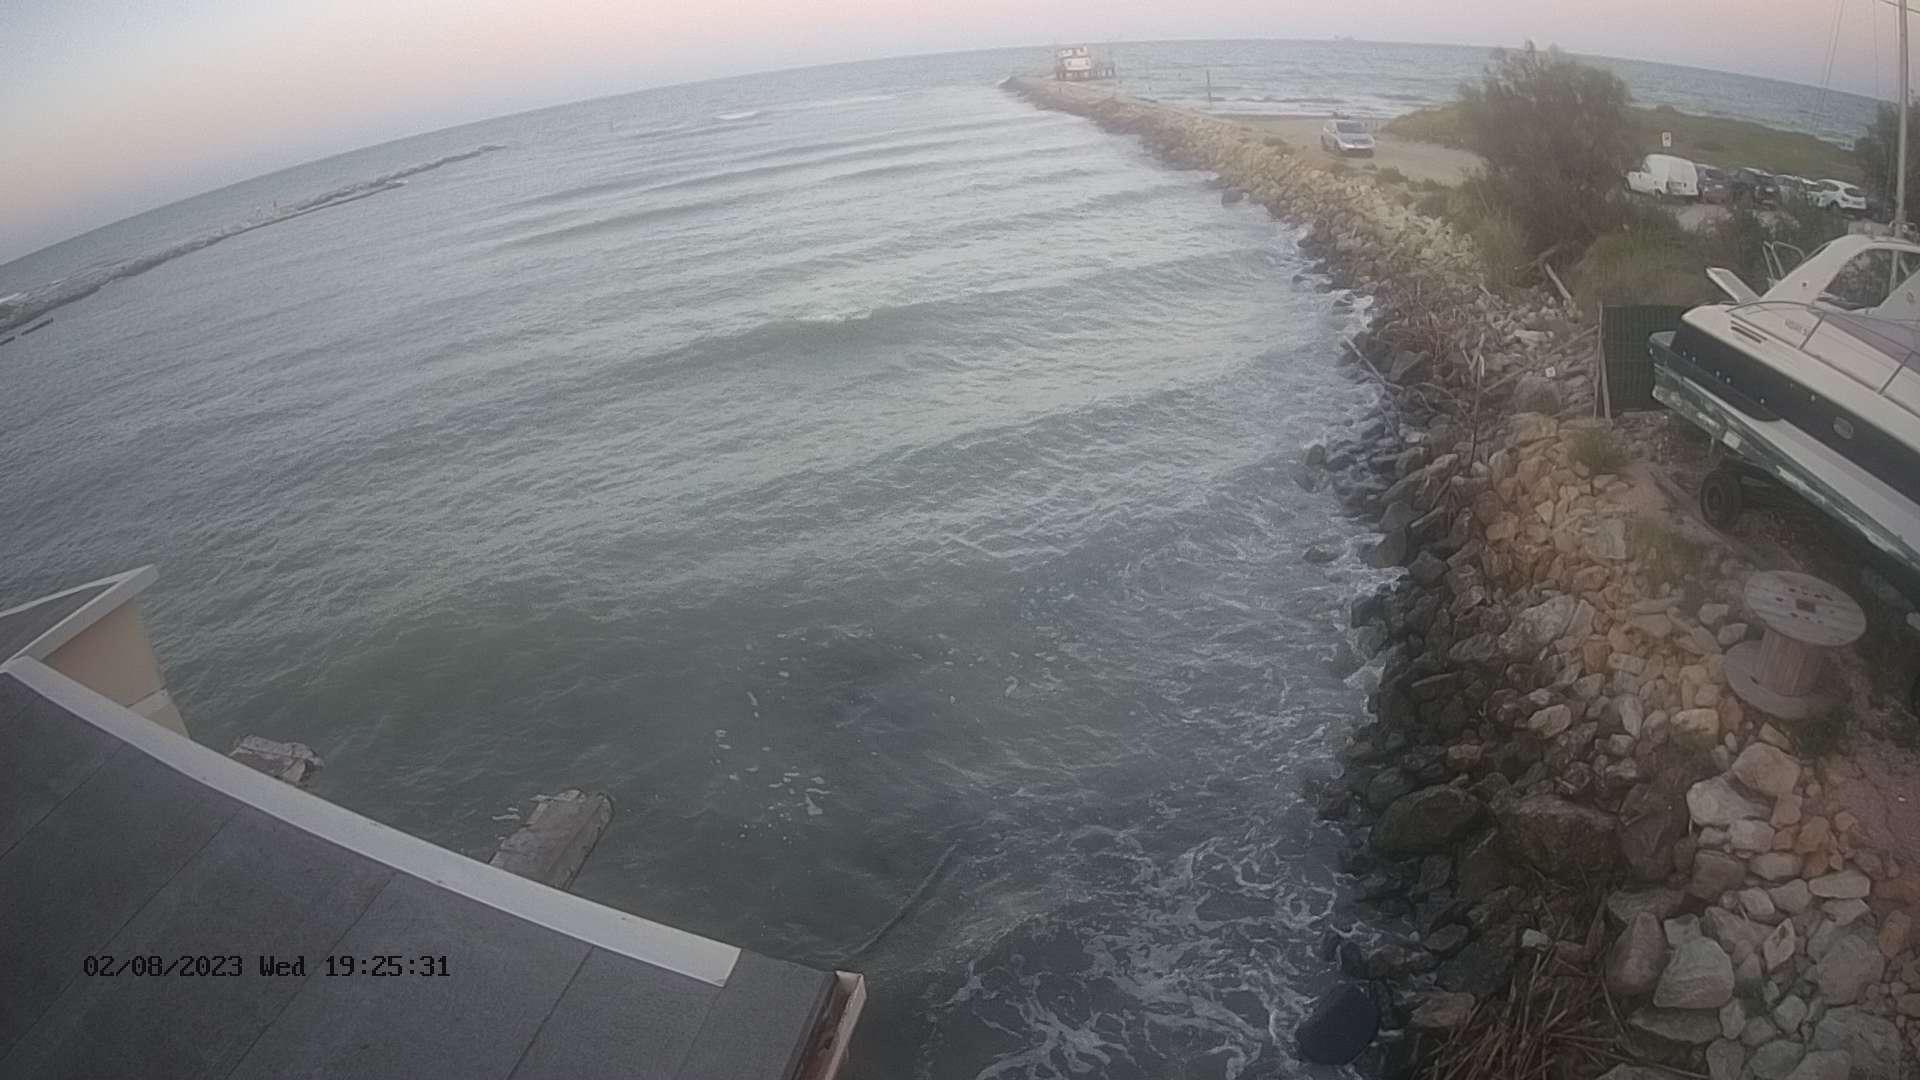 webcam bocabarranca marina romea